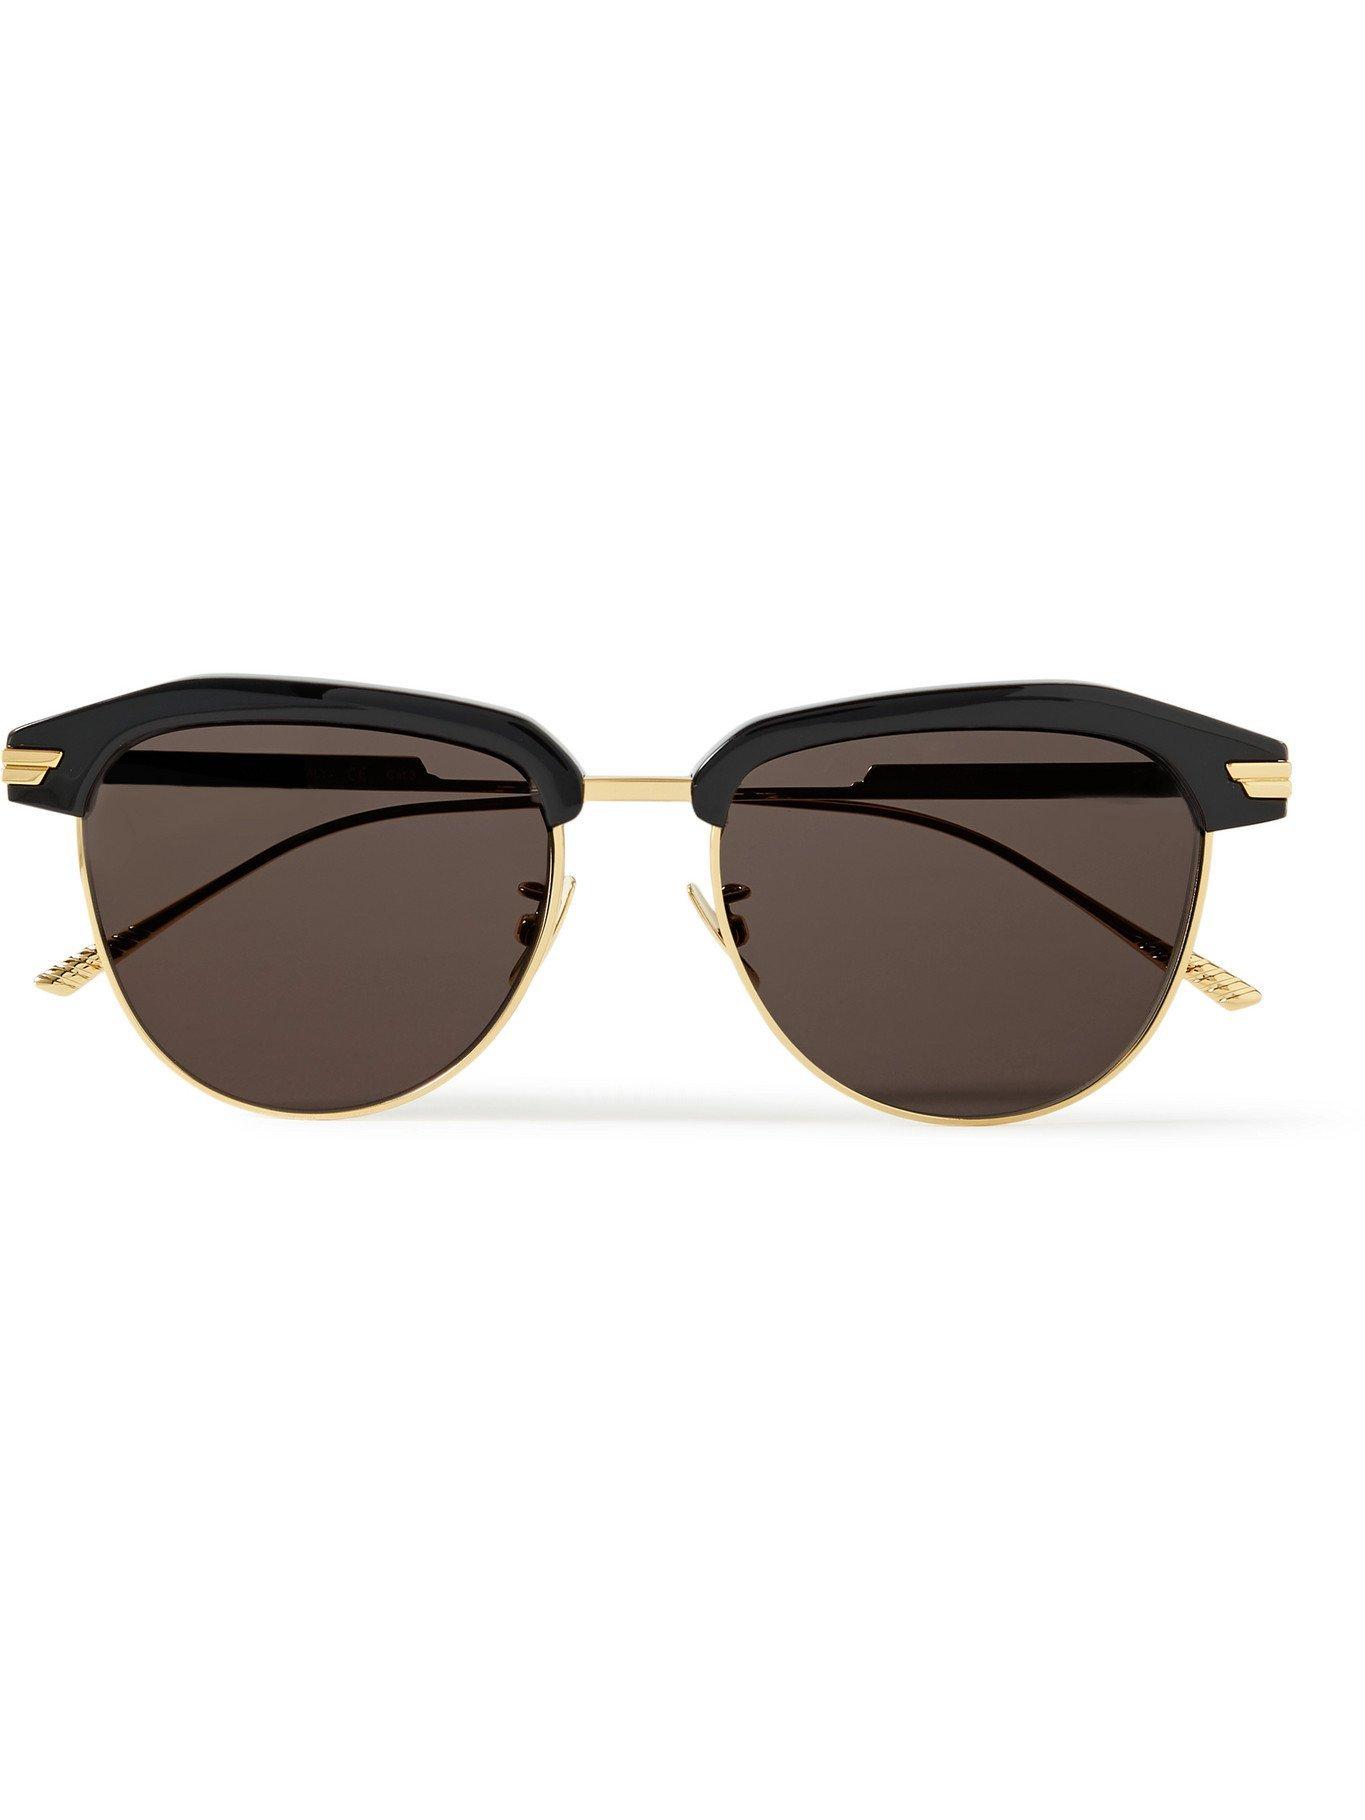 Photo: BOTTEGA VENETA - D-Frame Acetate and Gold-Tone Sunglasses - Black